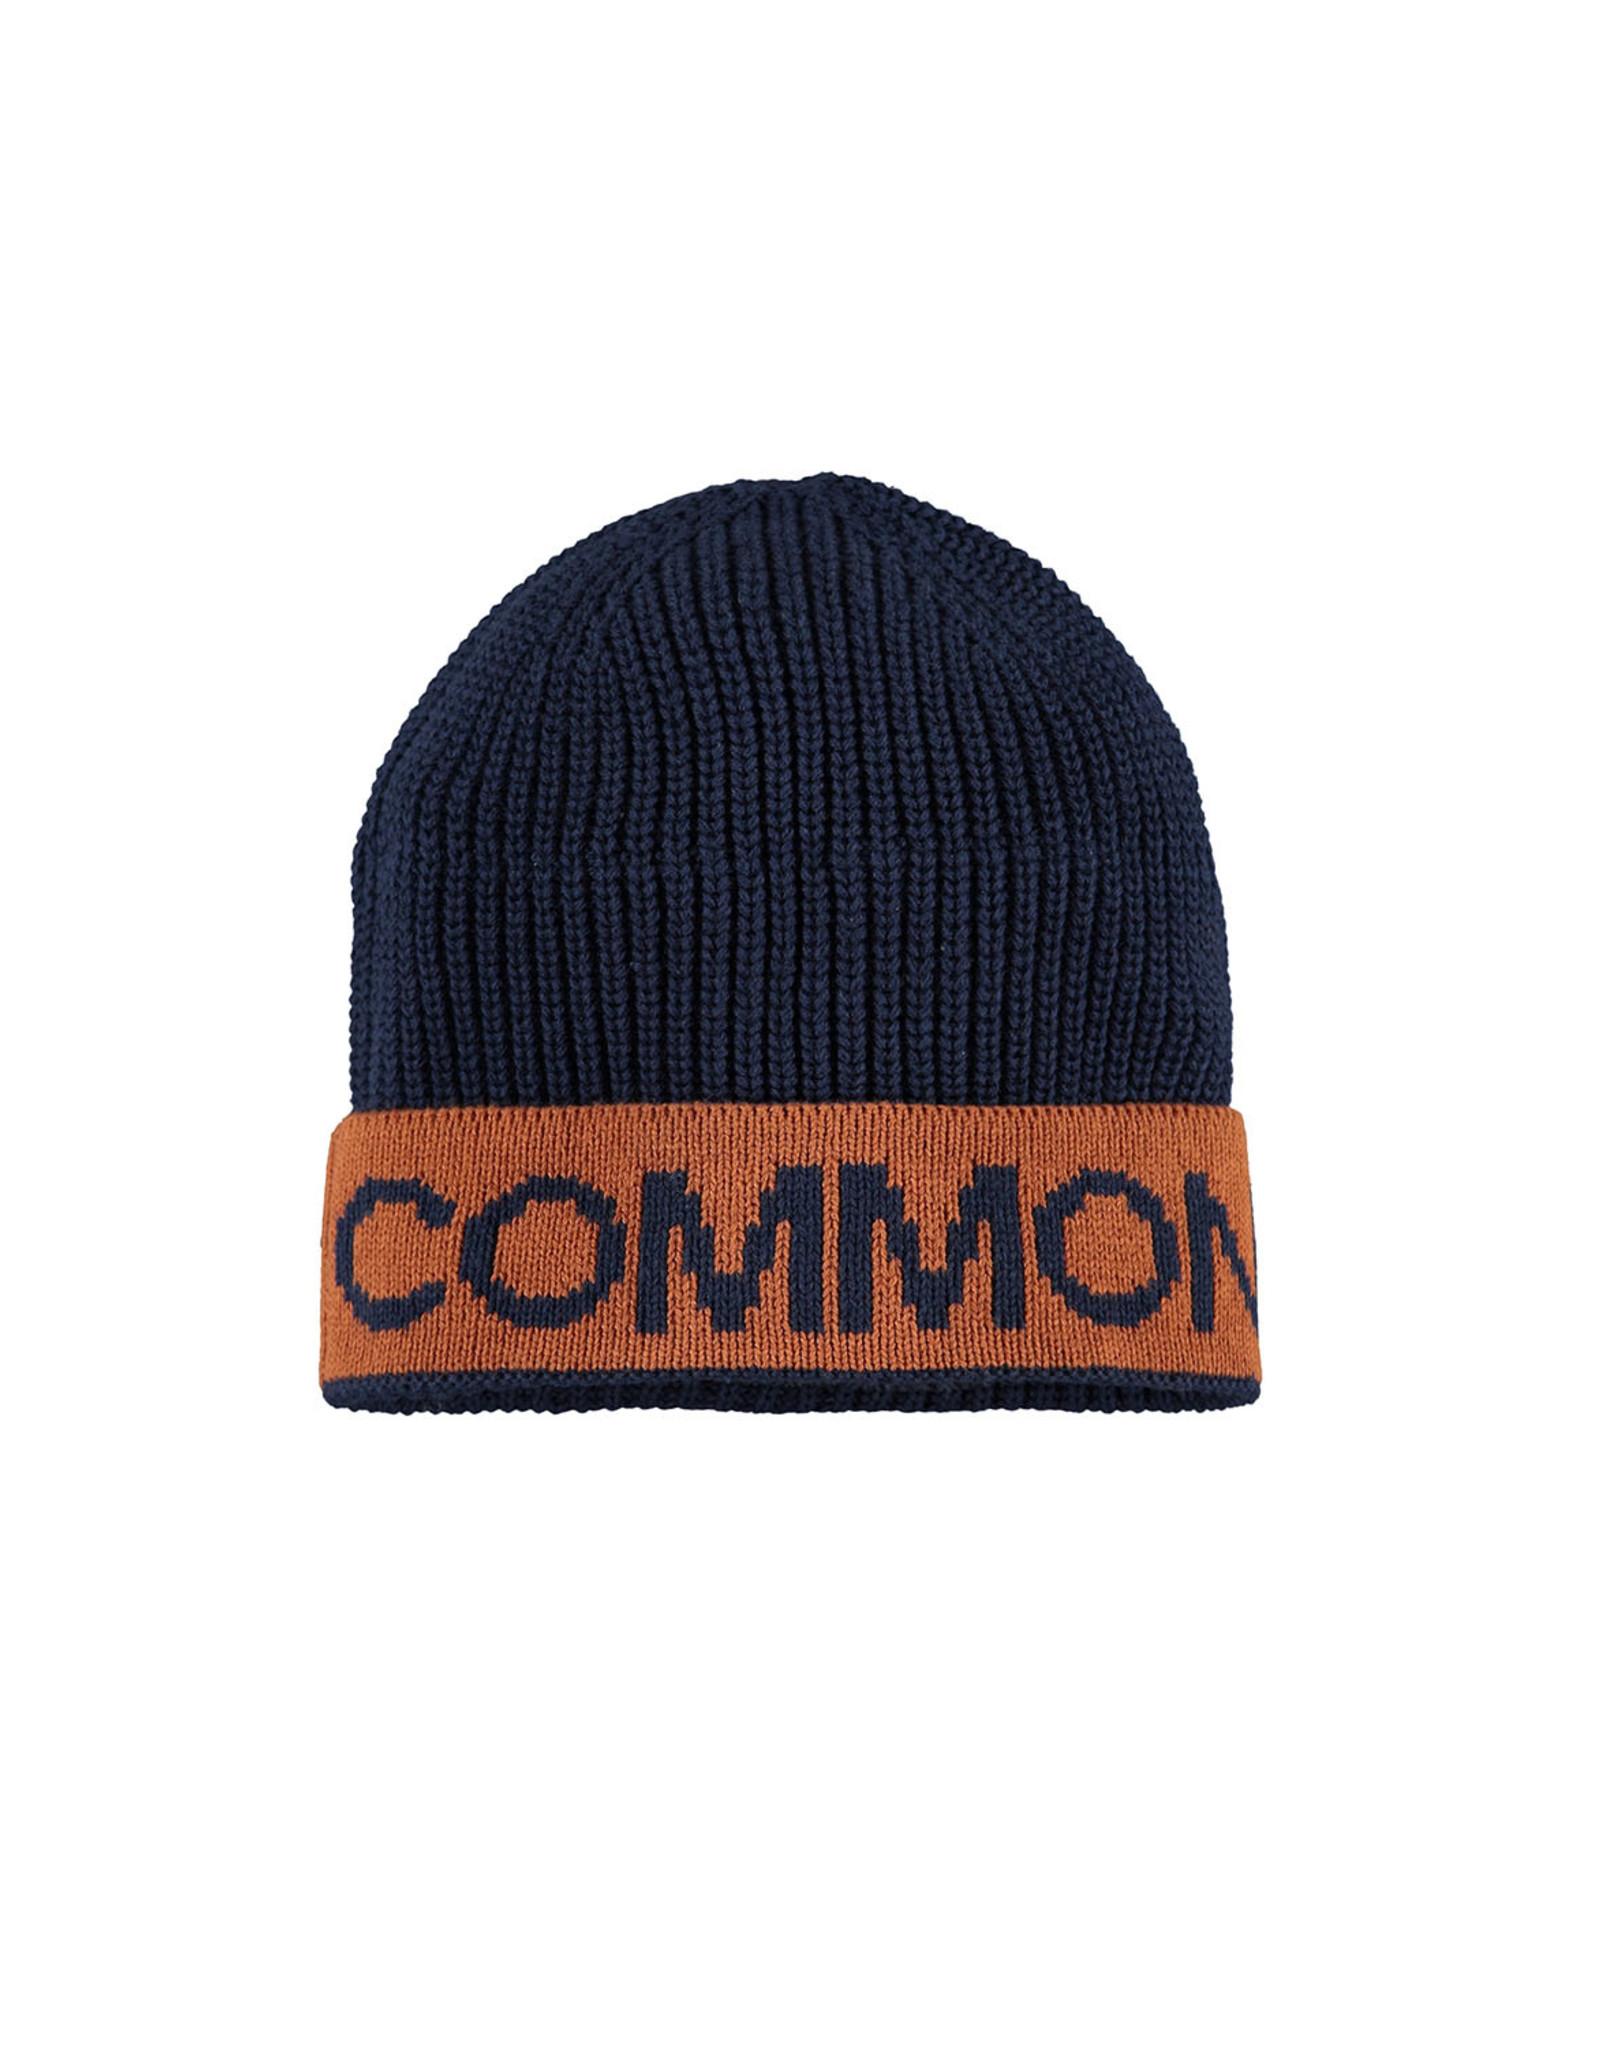 Common Heroes Common Heroes hat 6x Burnt Orange